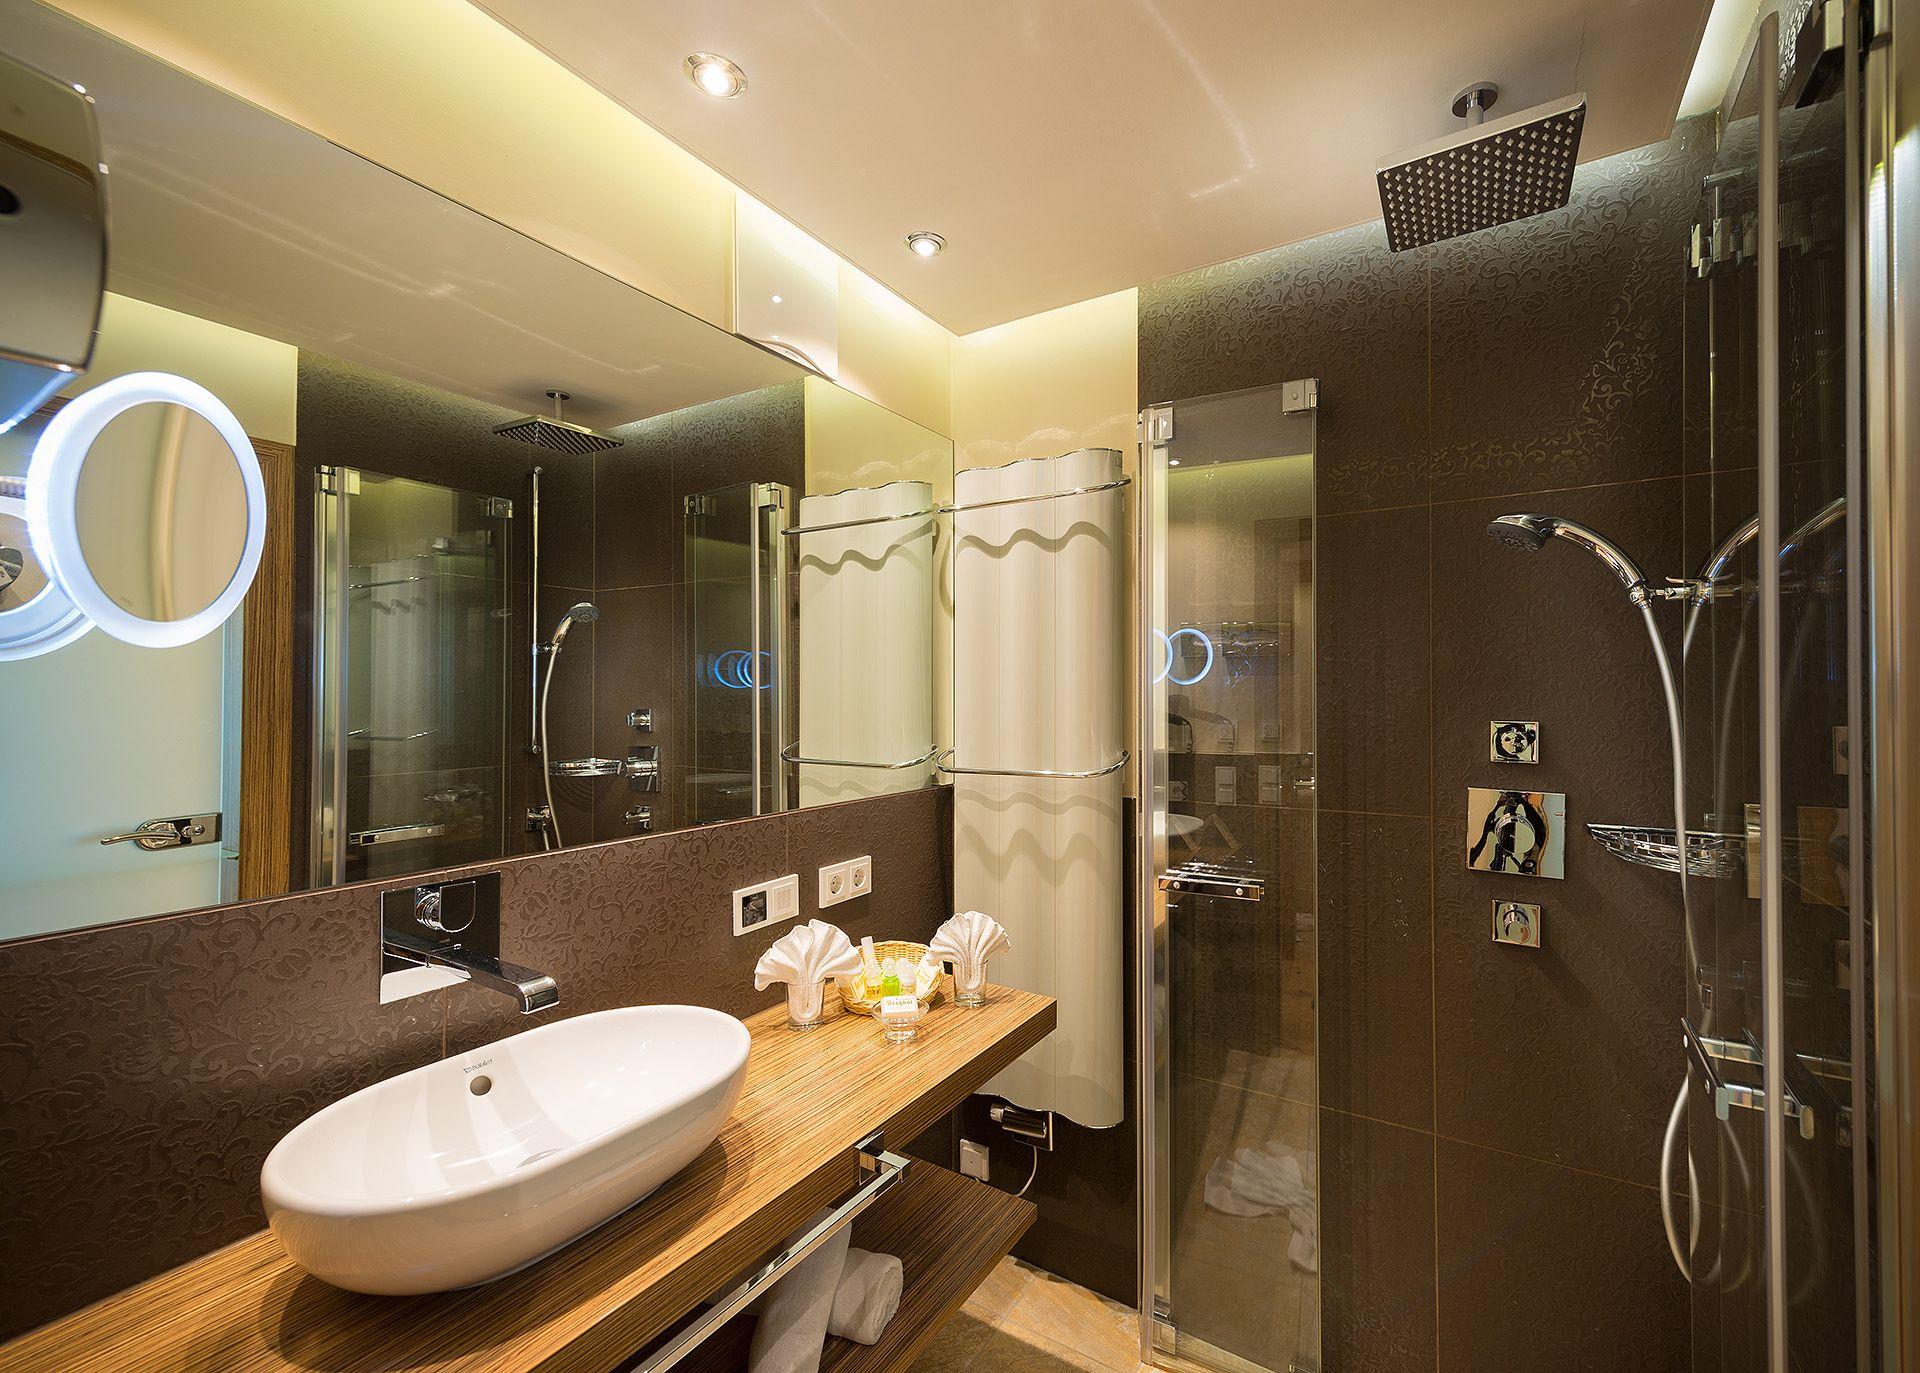 Badezimmer Sternenhimmel ~ Neue junior suiten badezimmer verwöhnhotel berghof 4 sterne